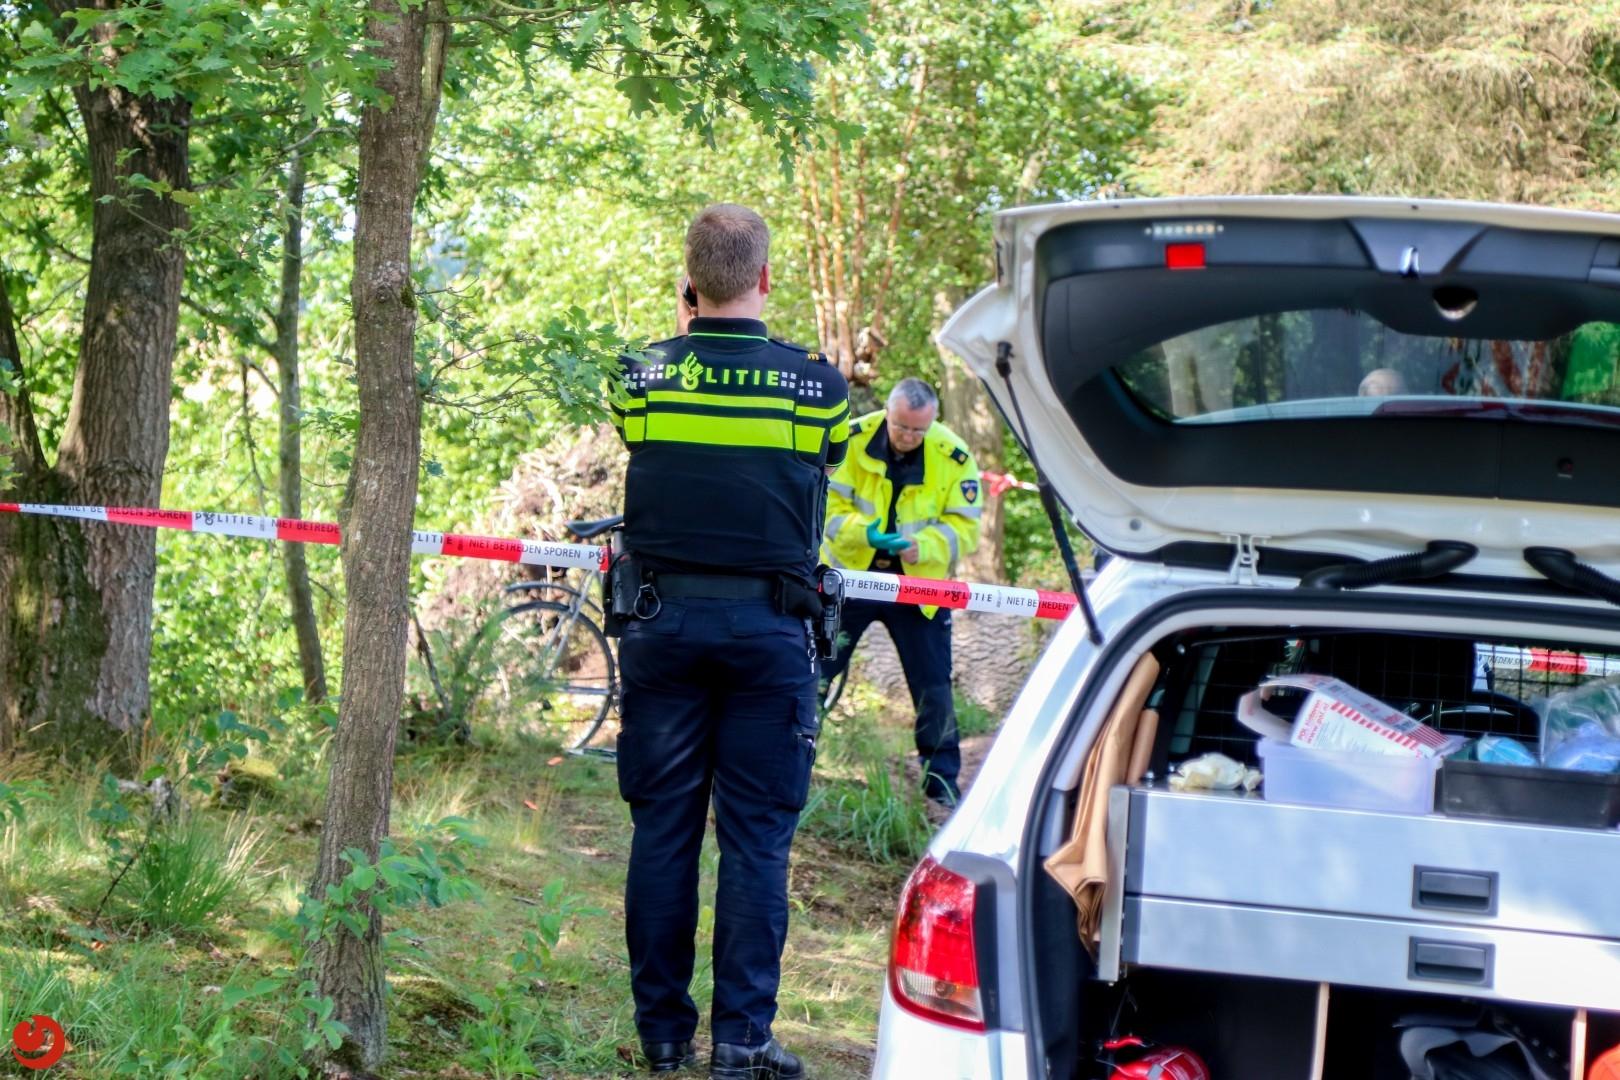 Man (55) omgekomen na noodlottig ongeval in bos